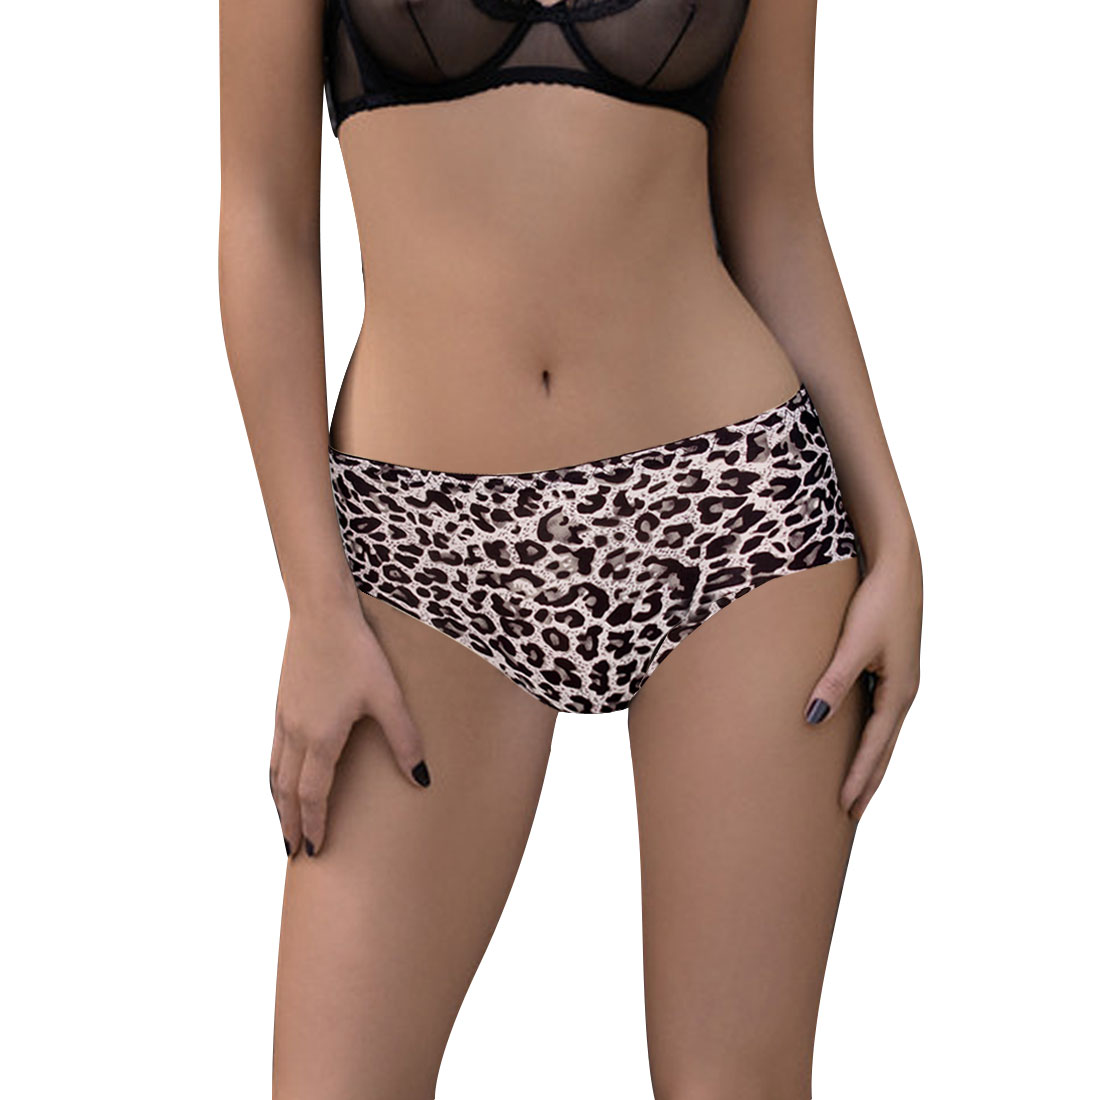 Ladies Elastic Waist Black Leopard Print Seamless Panties Light Pink XS